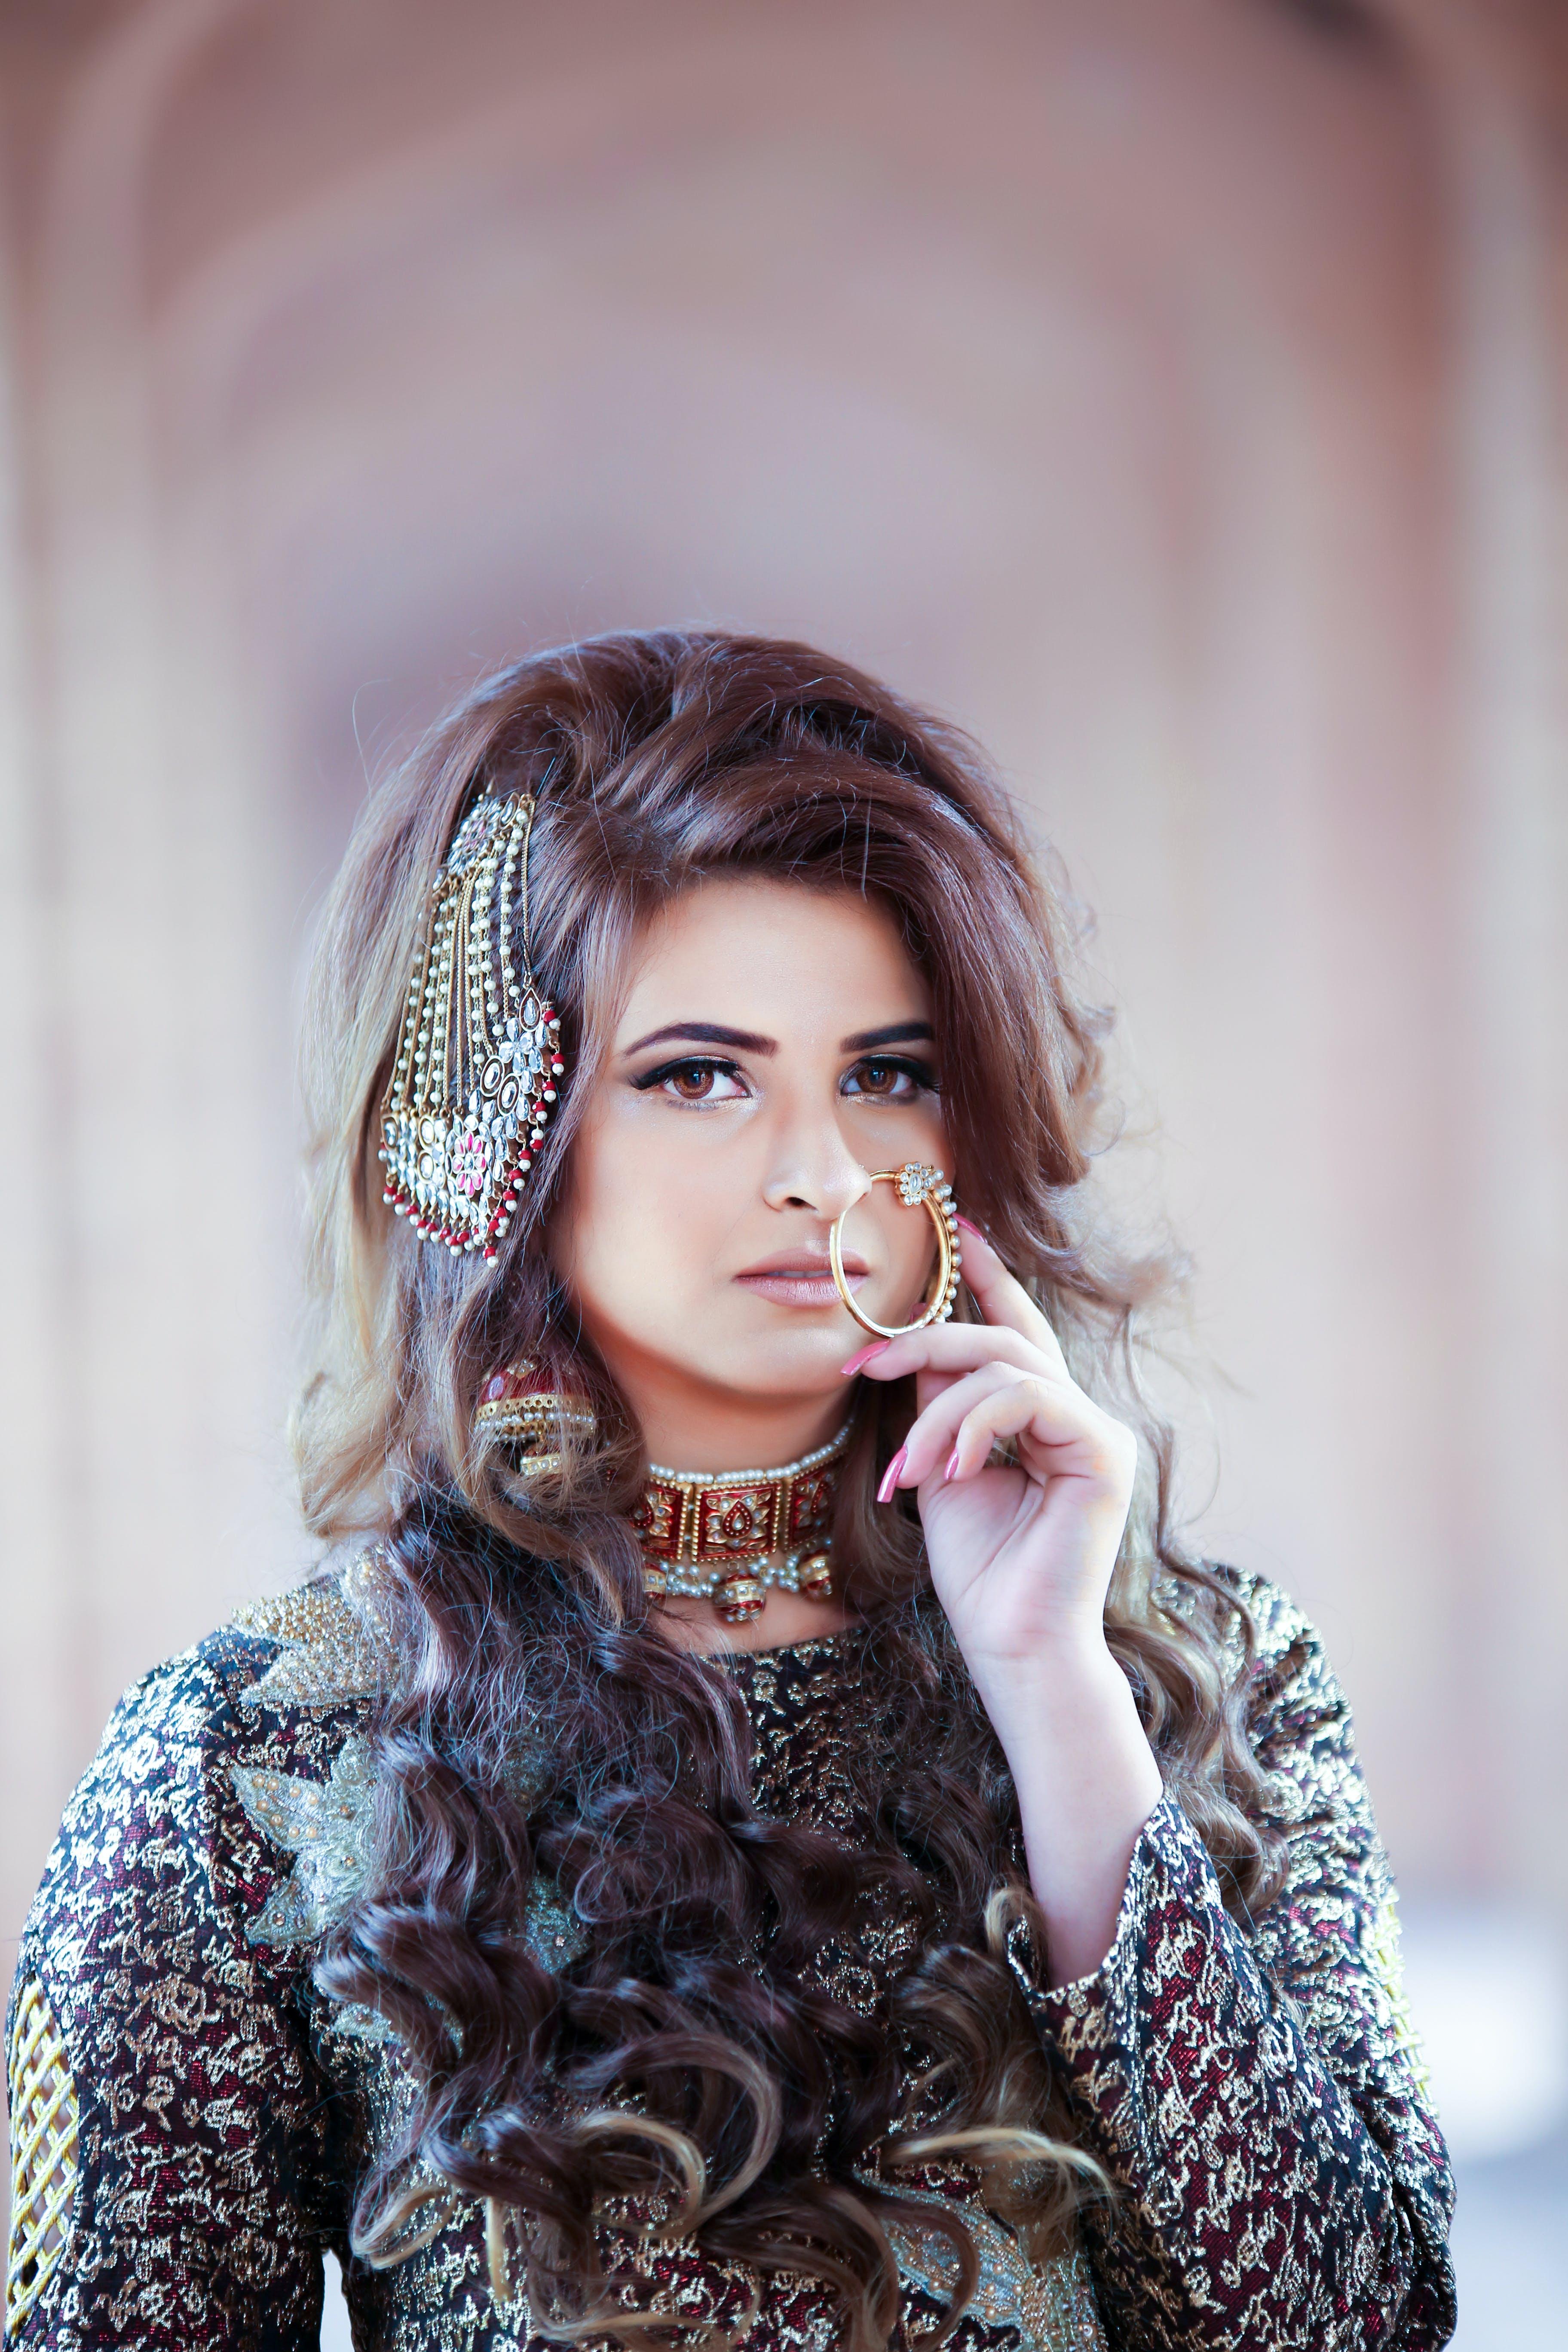 Free stock photo of fashion, fashion model, female model, ornaments